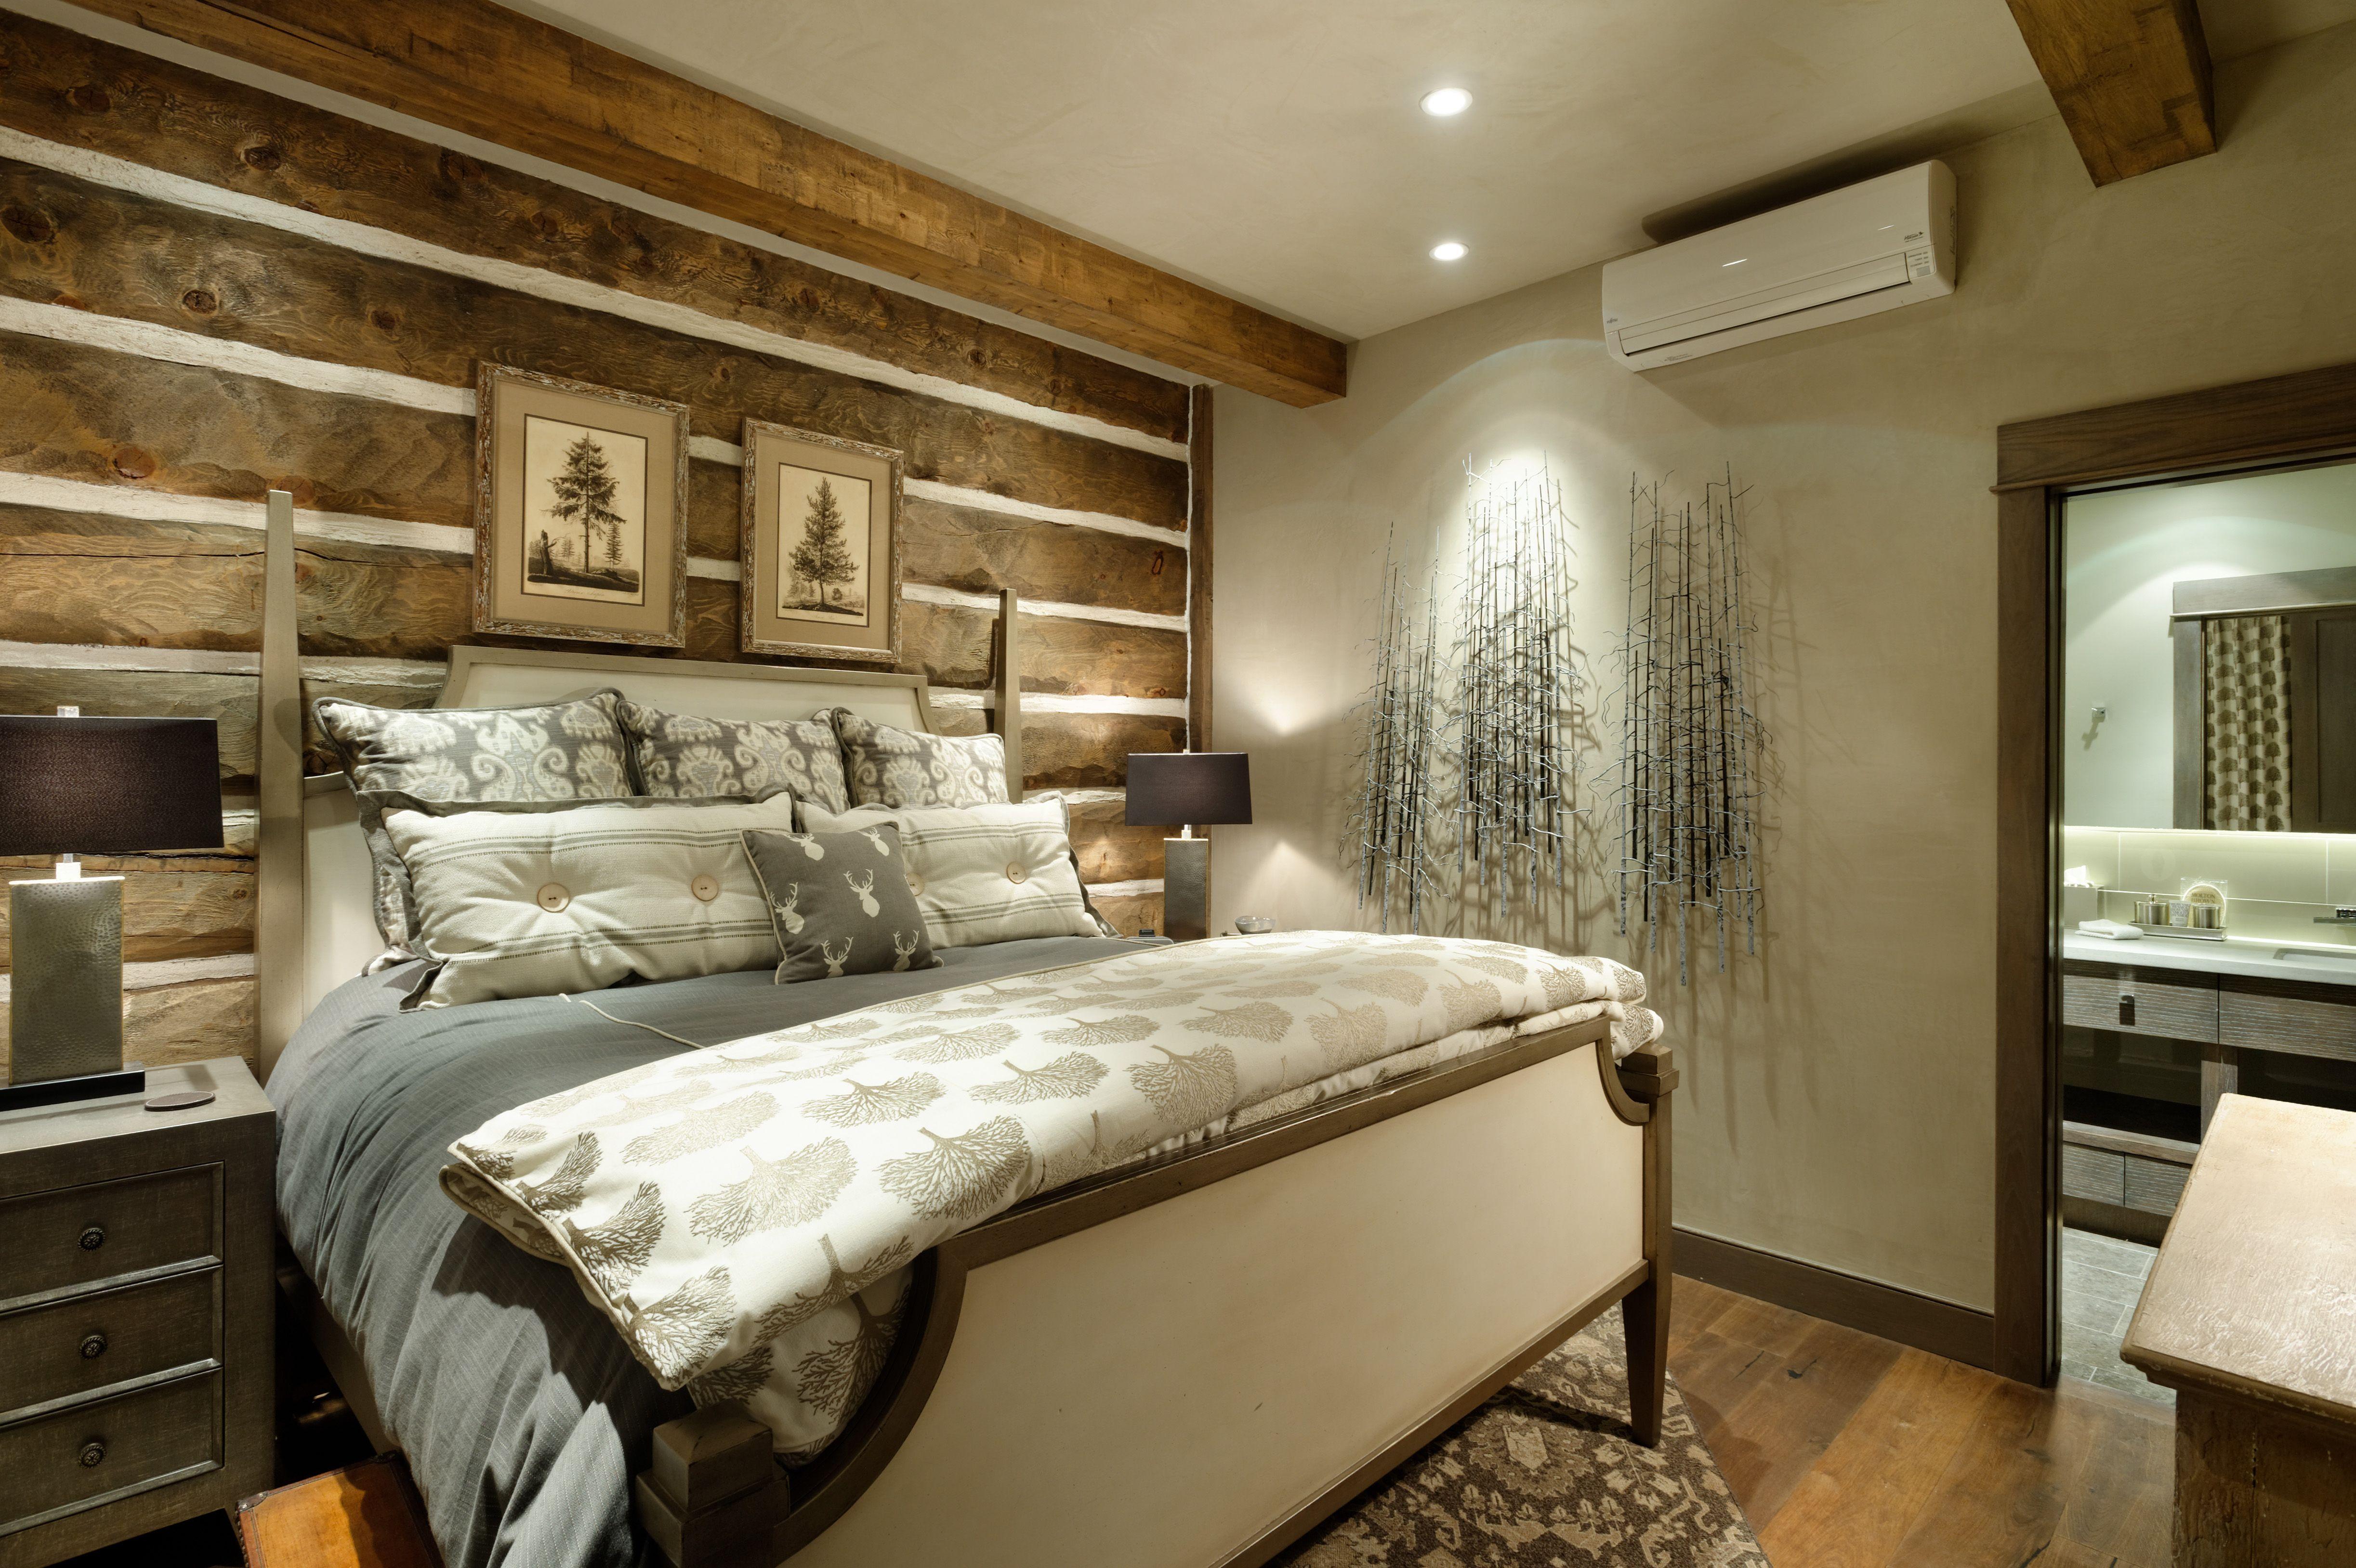 Aspen Log Cabin - Bedroom - Aspen, Co - Cuv